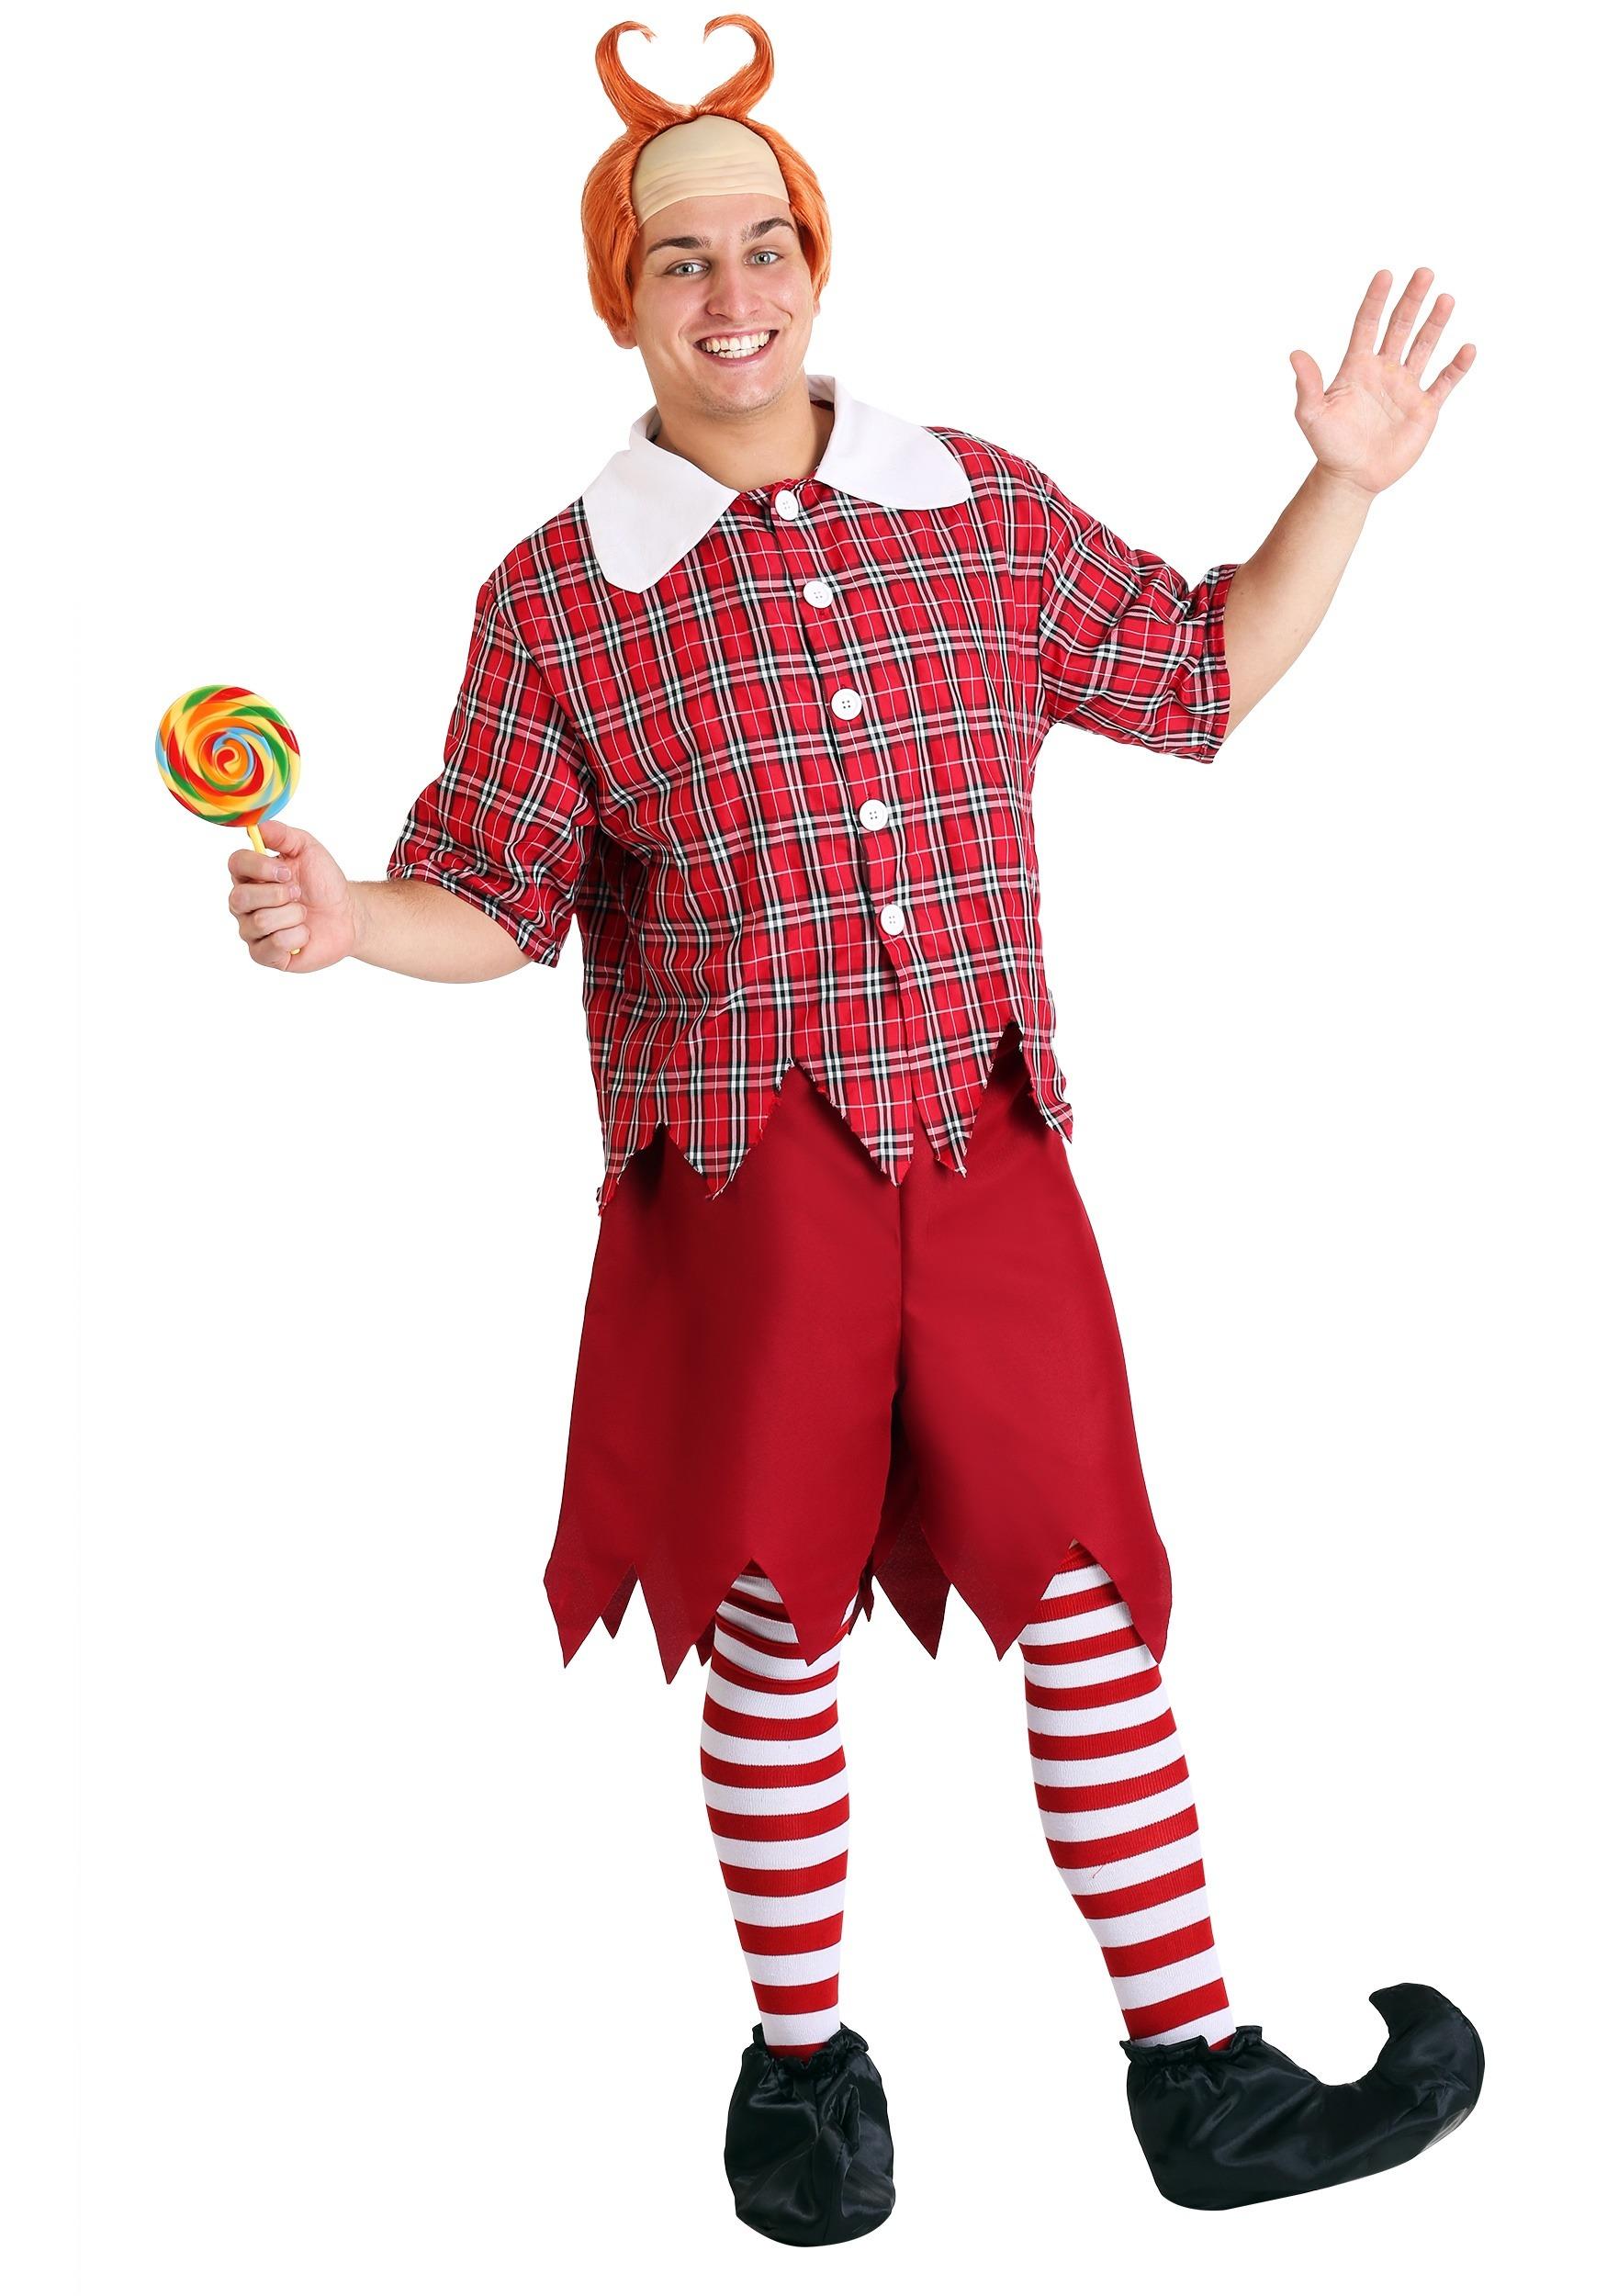 Wizard of oz munchkin costumes adult red munchkin costume solutioingenieria Images